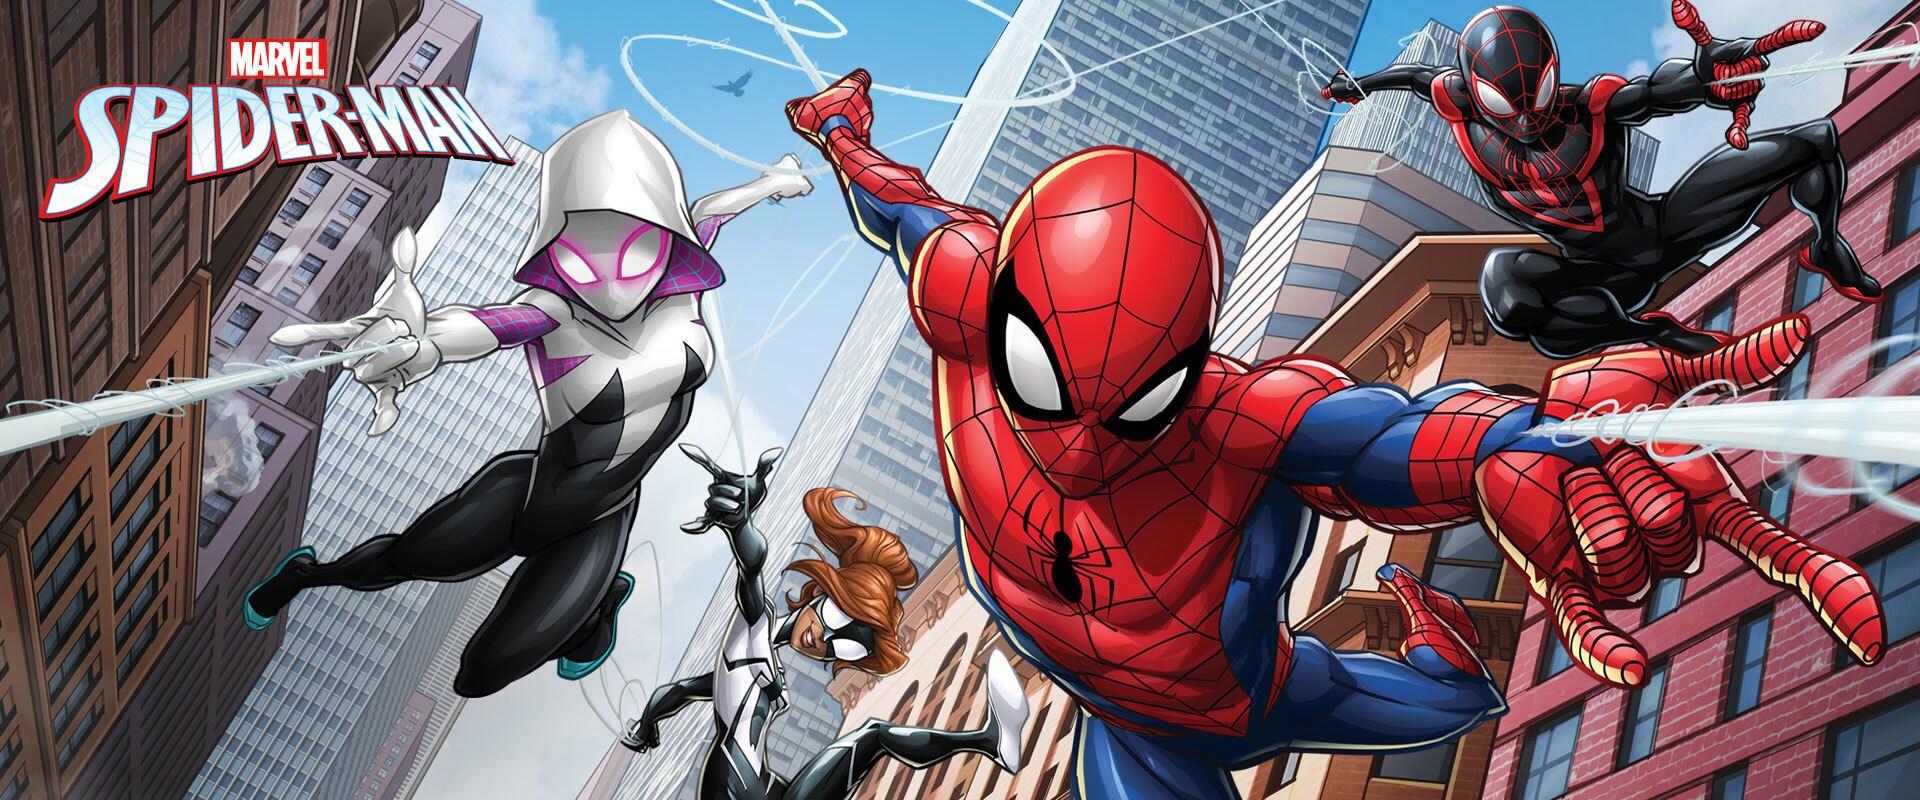 Marvel's Spider-Man - Season 2 - Flex-Content Hero Object - video